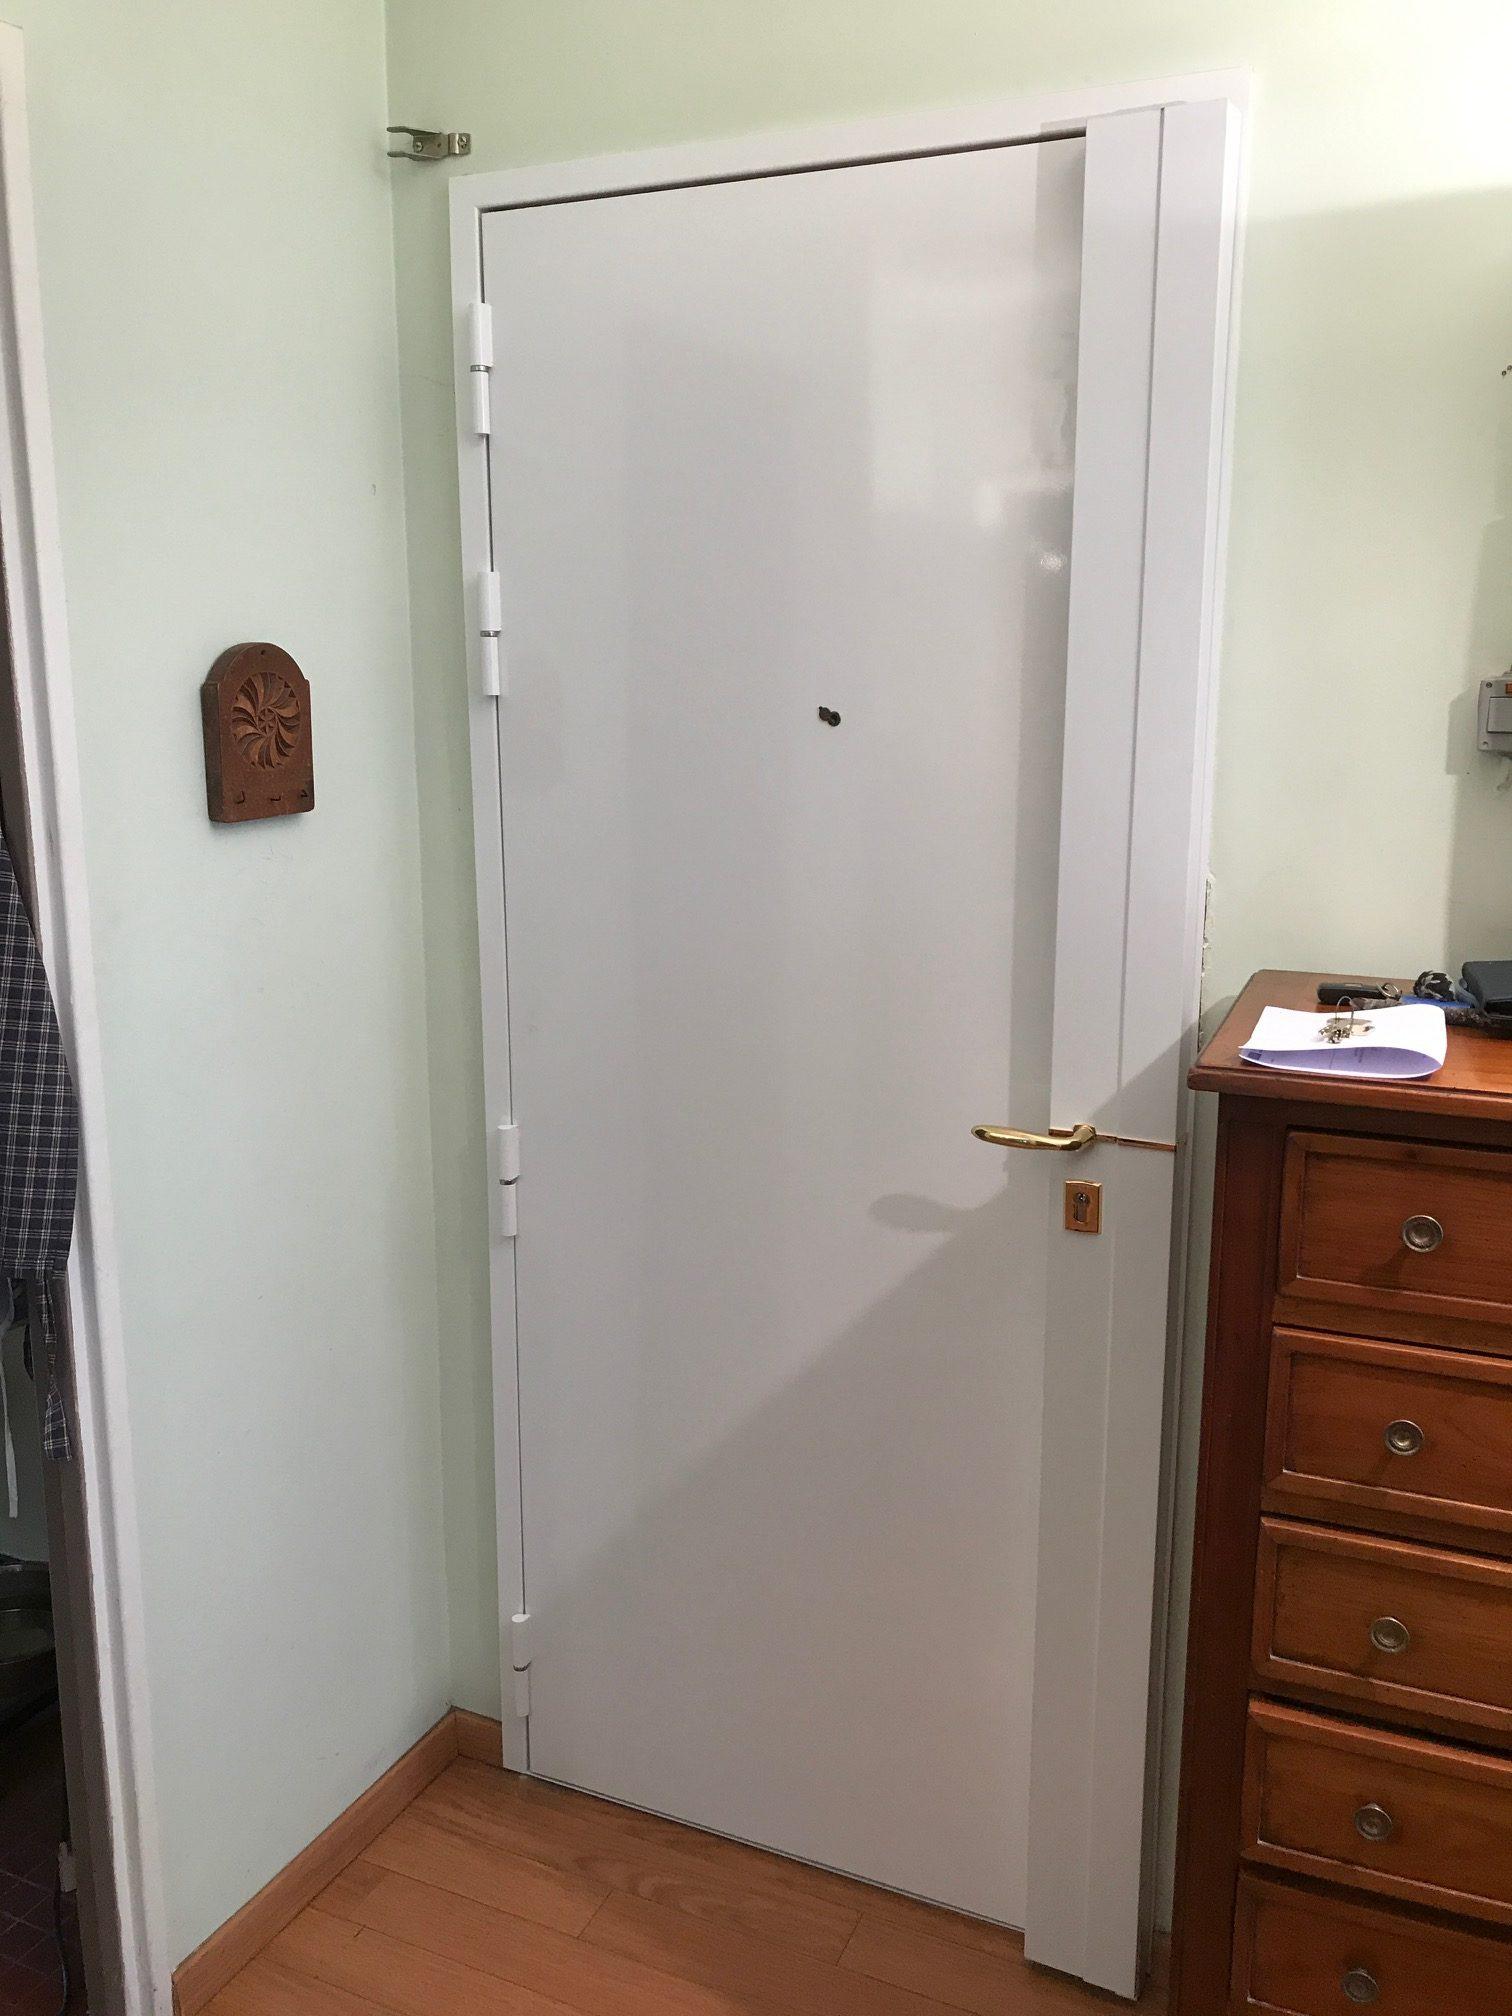 Bloc blindage de porte avec serrure Fichet Alicea